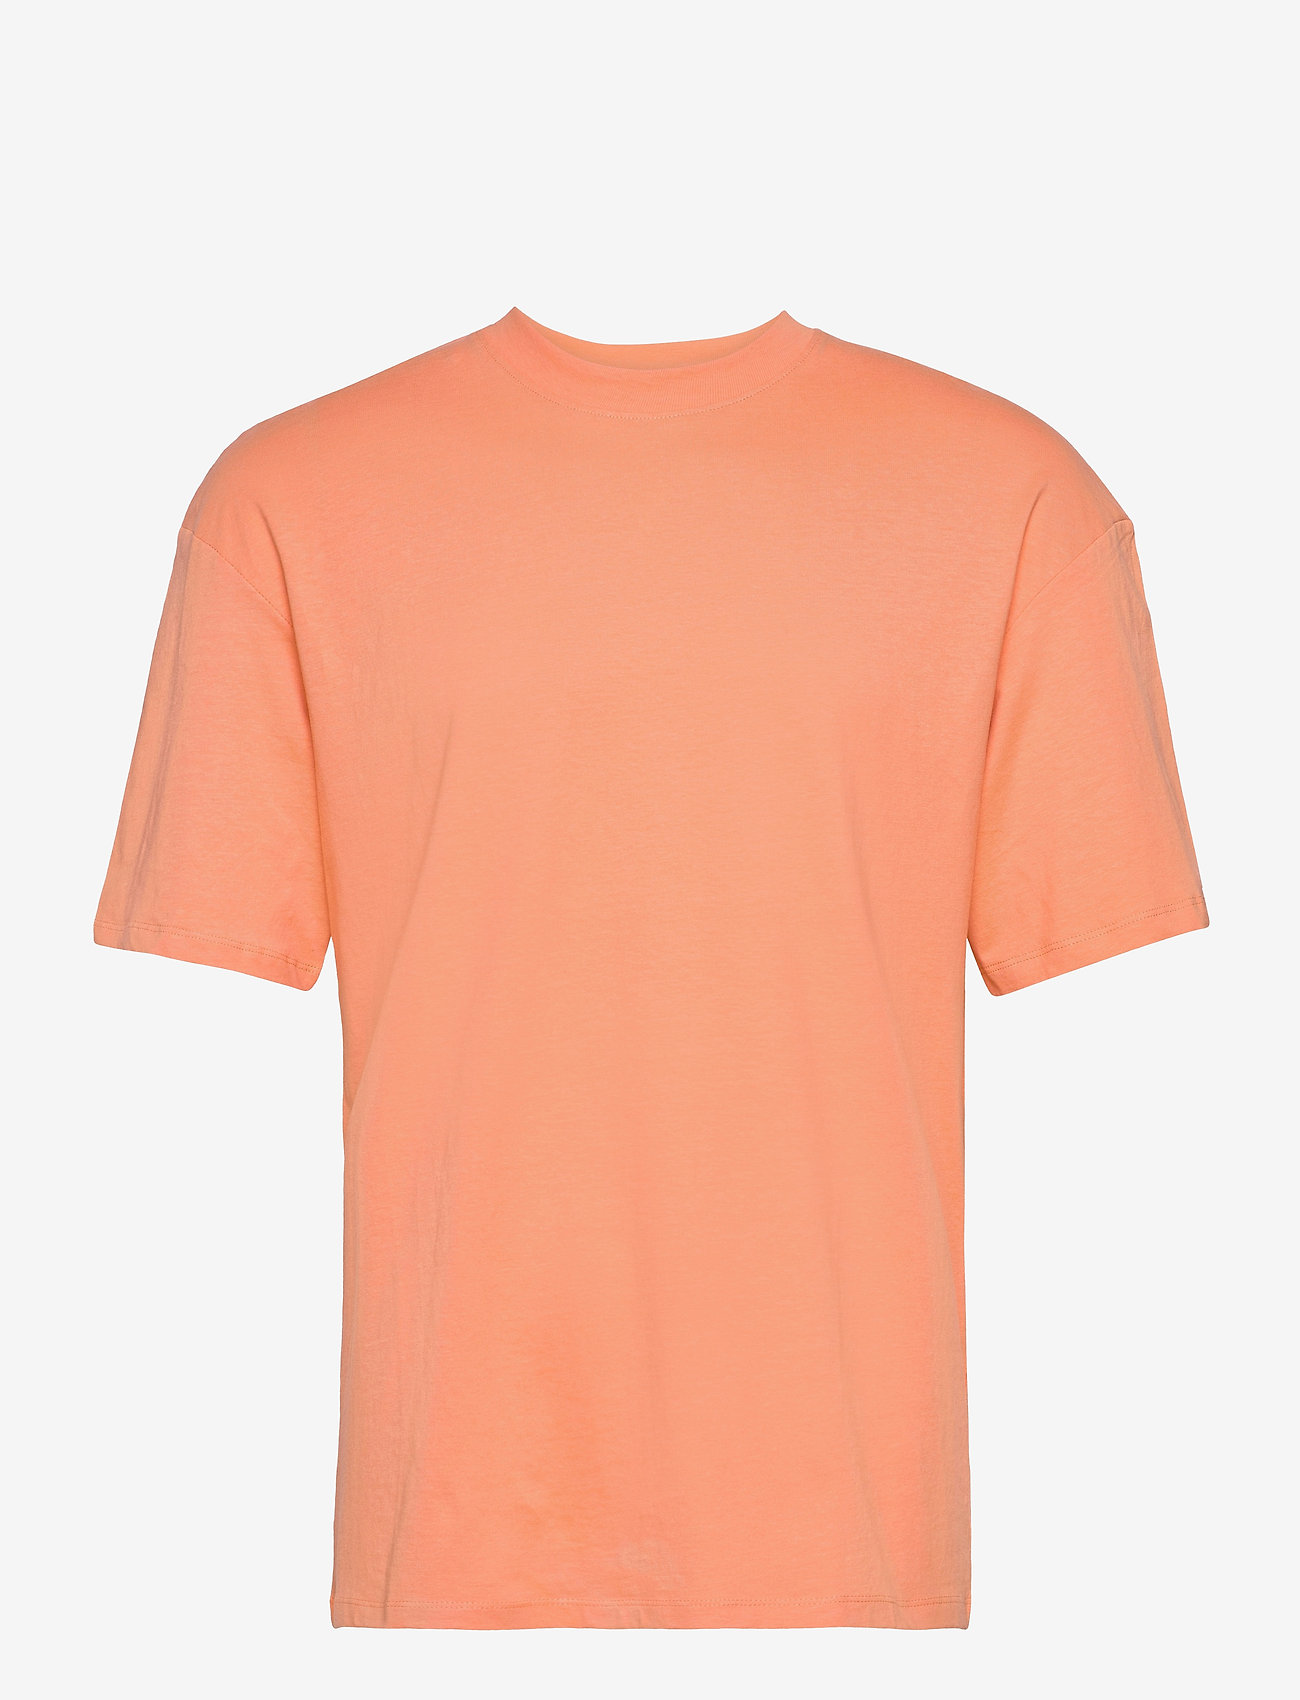 Jack & Jones - JORBRINK TEE SS CREW NECK - basic t-shirts - shell coral - 0